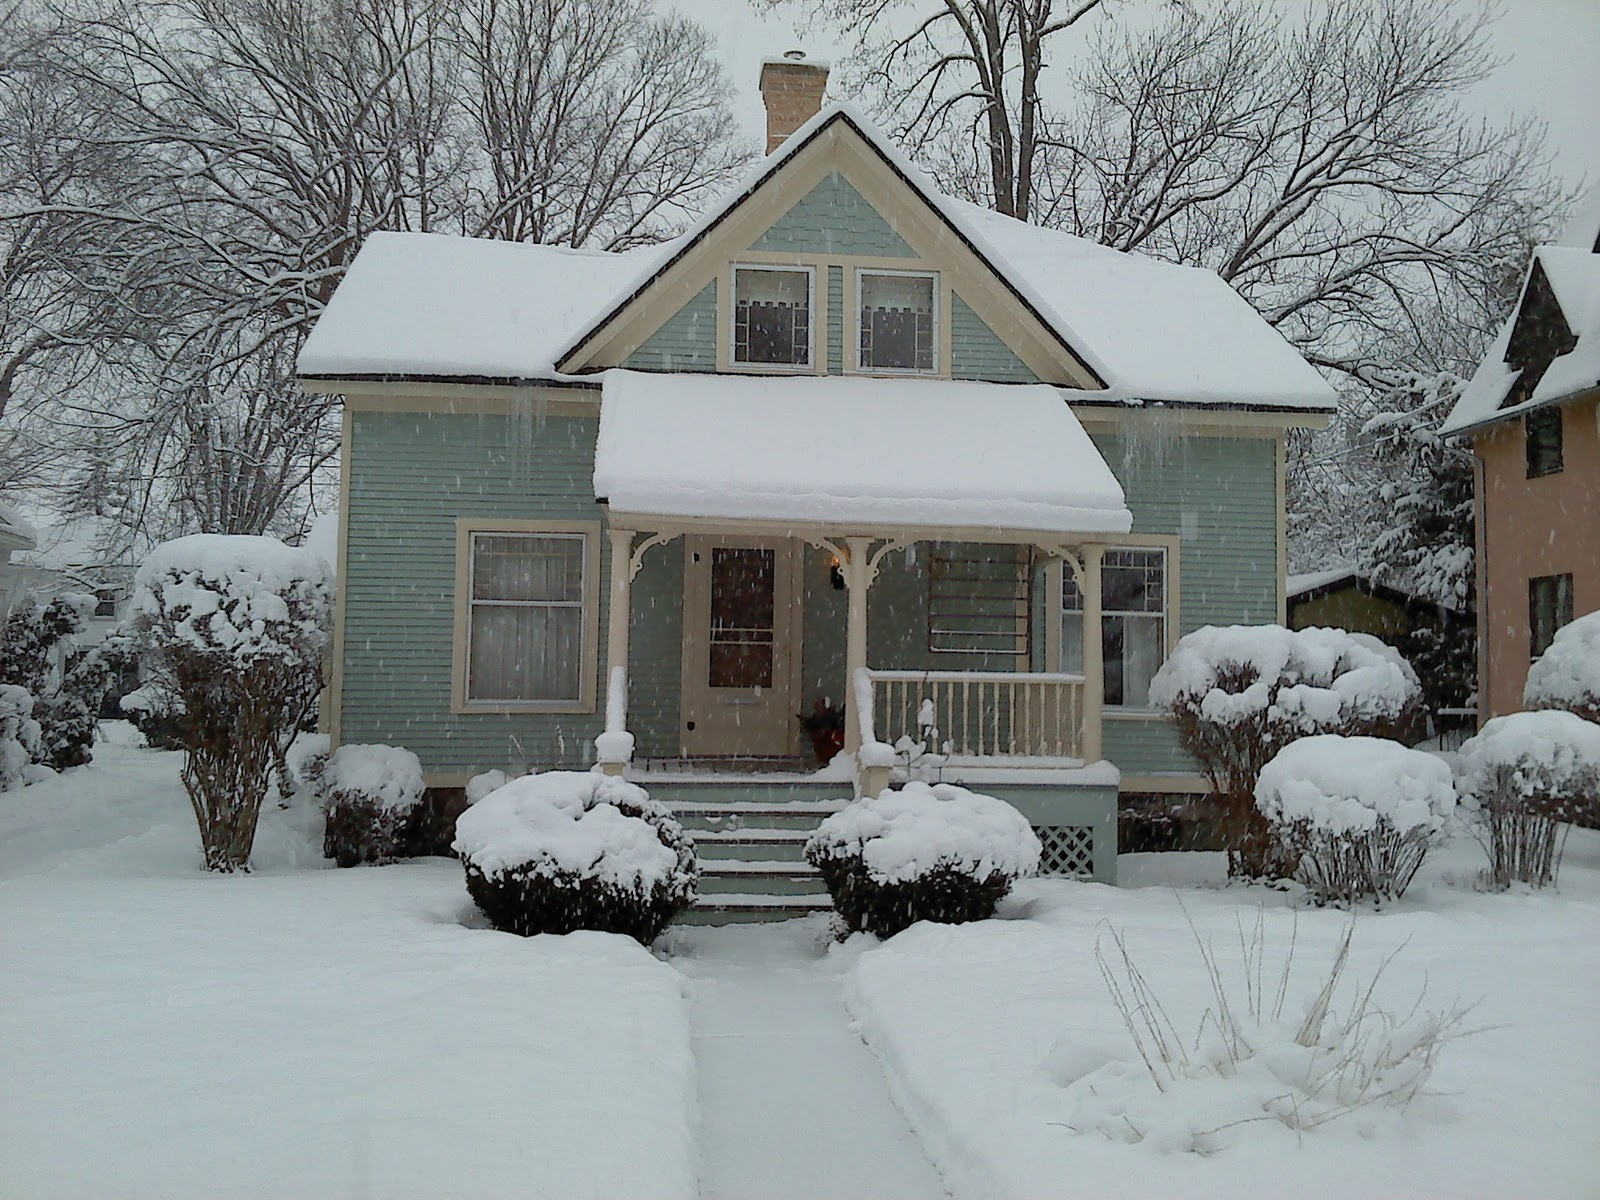 Free photo: Snowy Neighborhood, Winter - Free Image on Pixabay ...